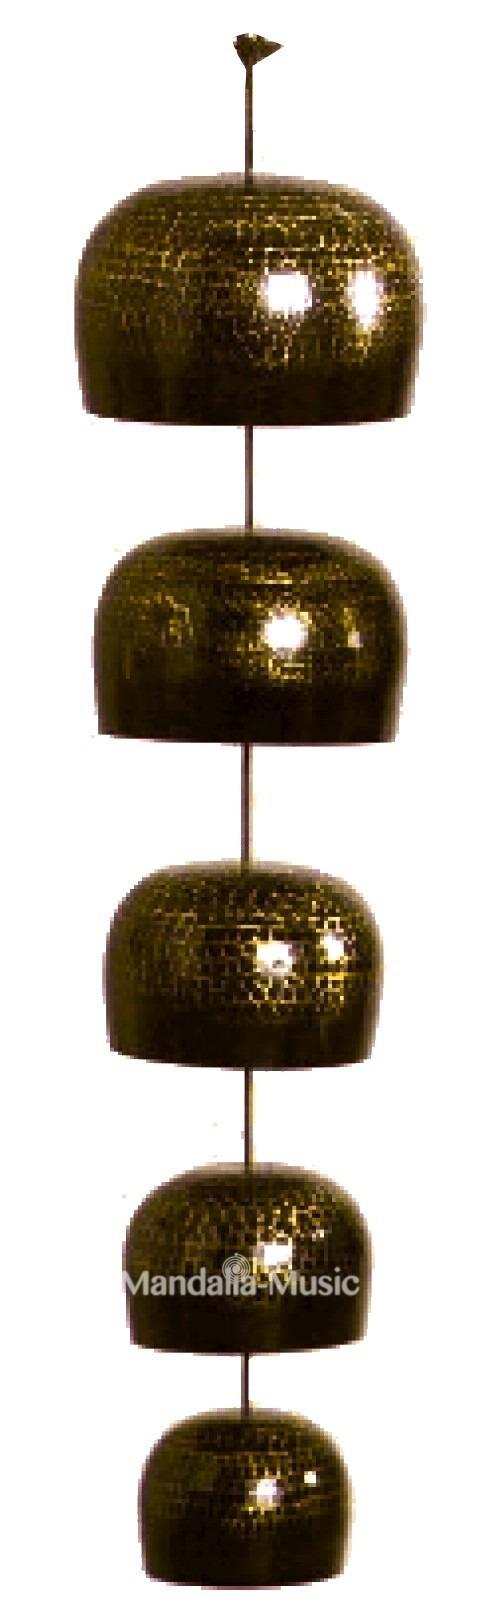 Carillons de bols chinois